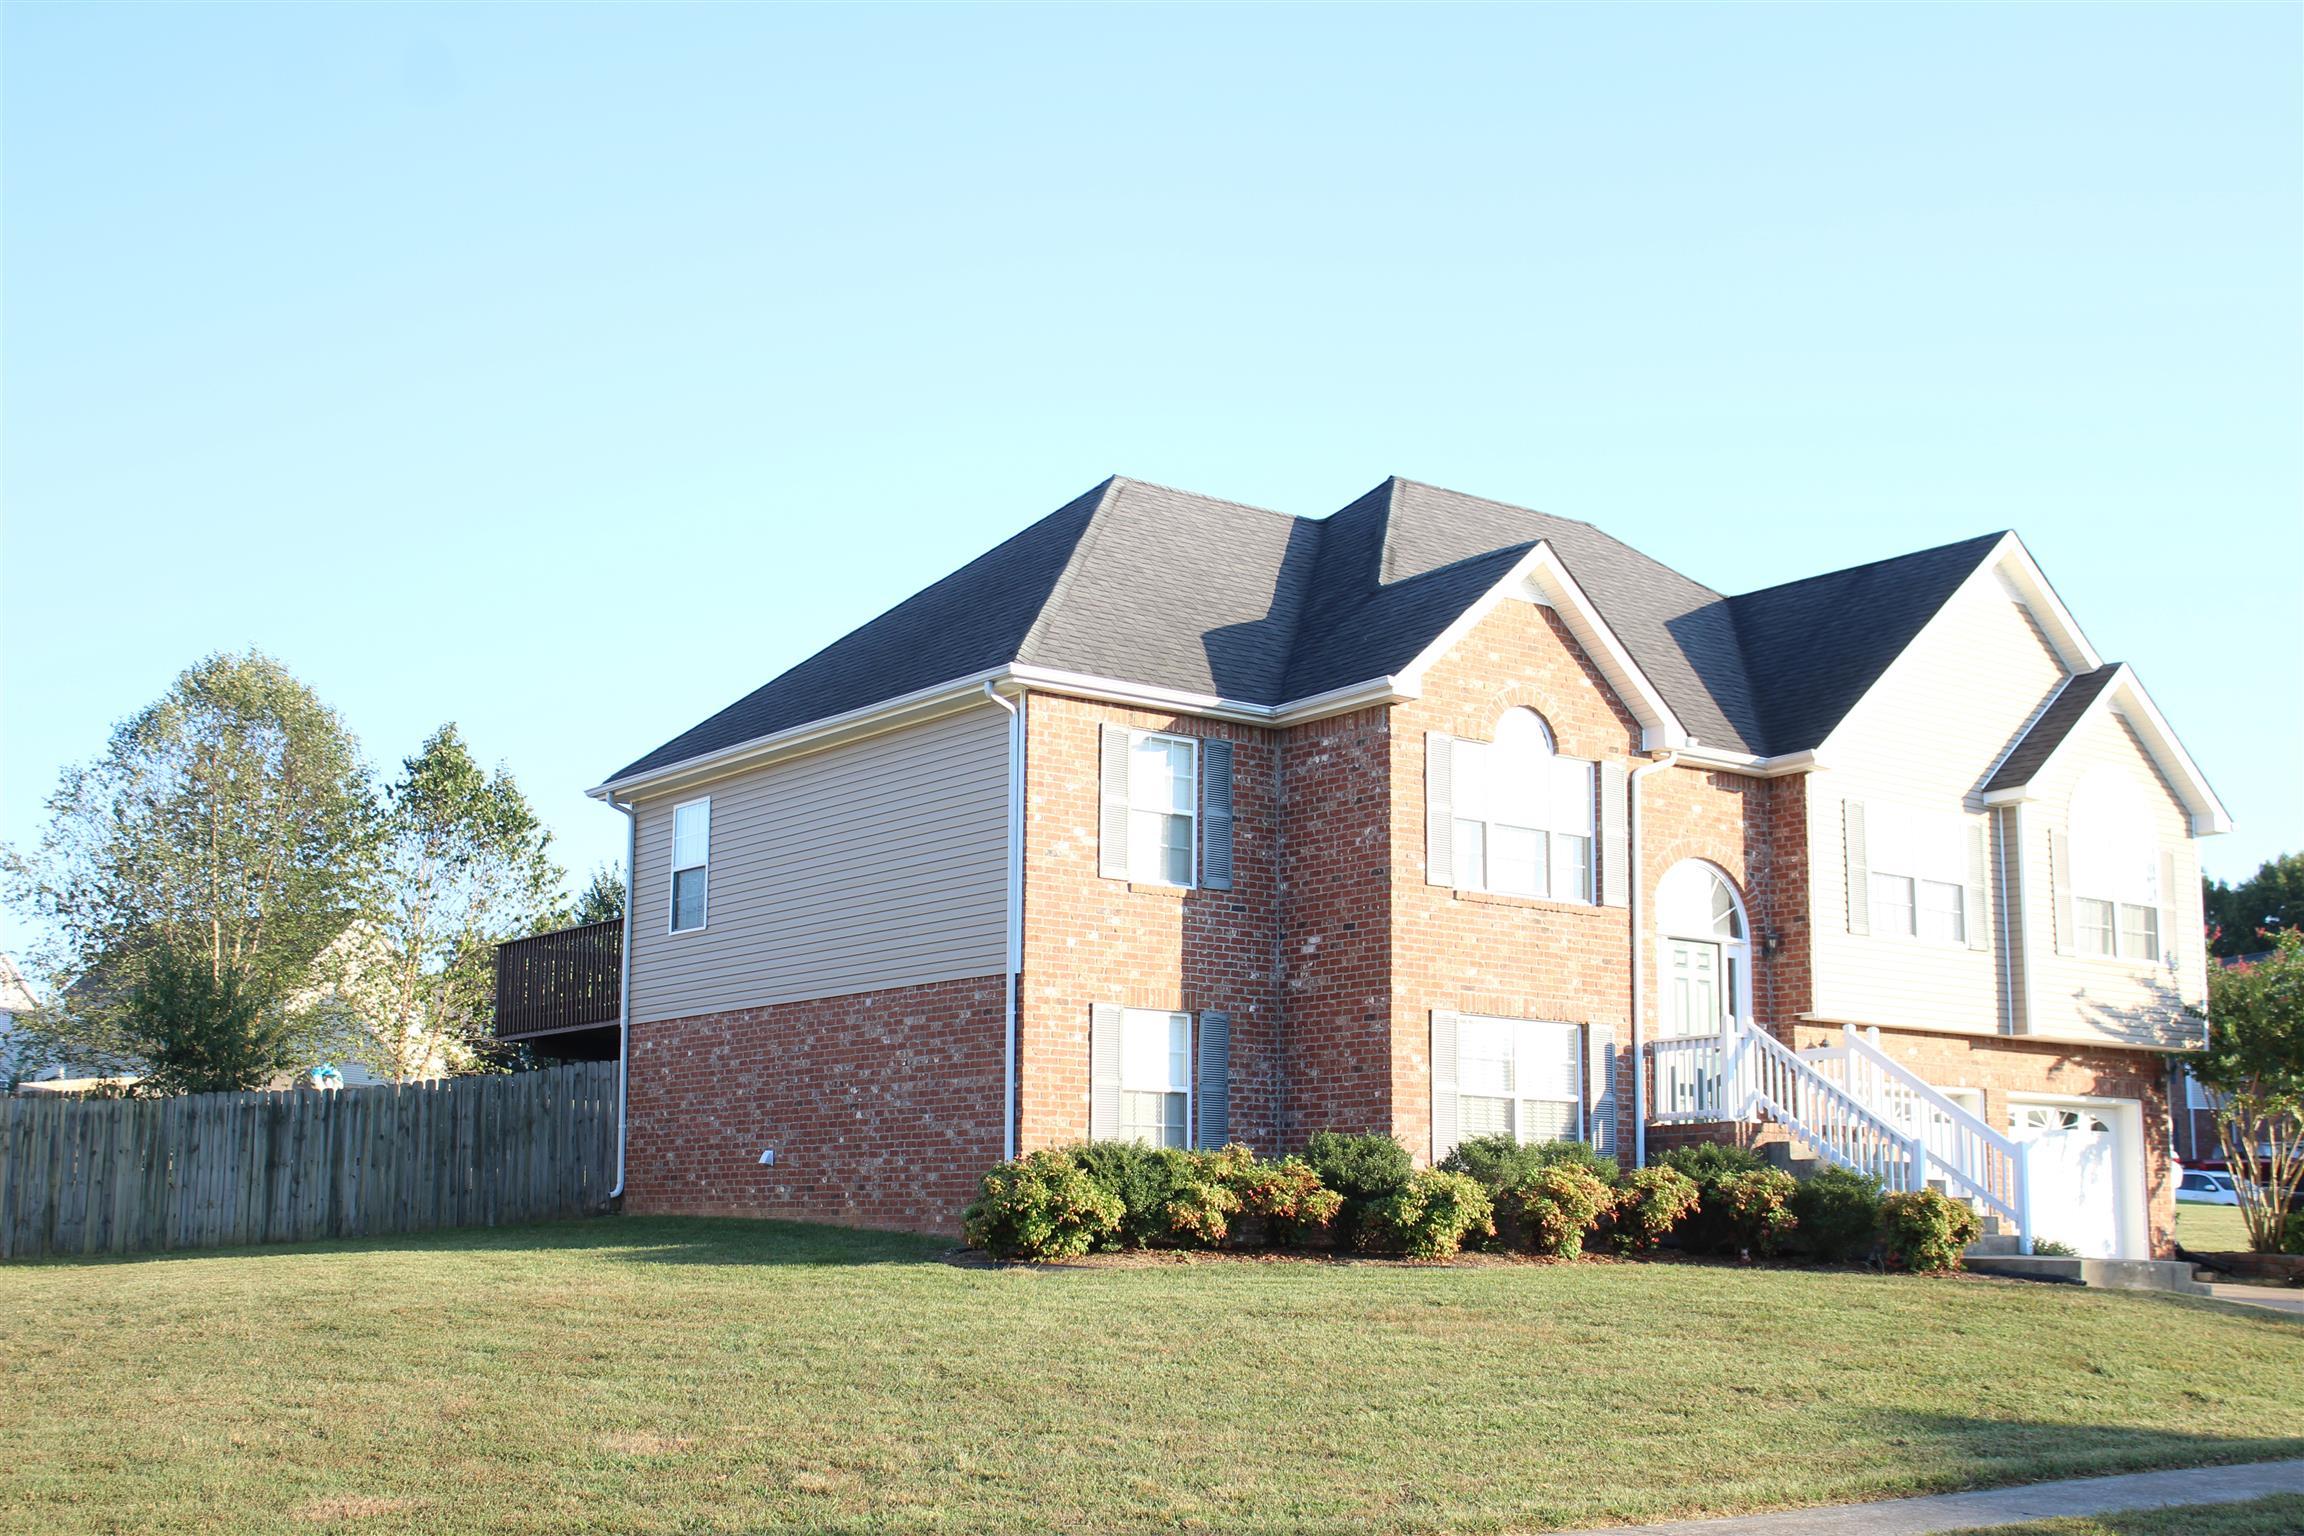 430 Short Bluff Dr, Clarksville, TN 37040 - Clarksville, TN real estate listing